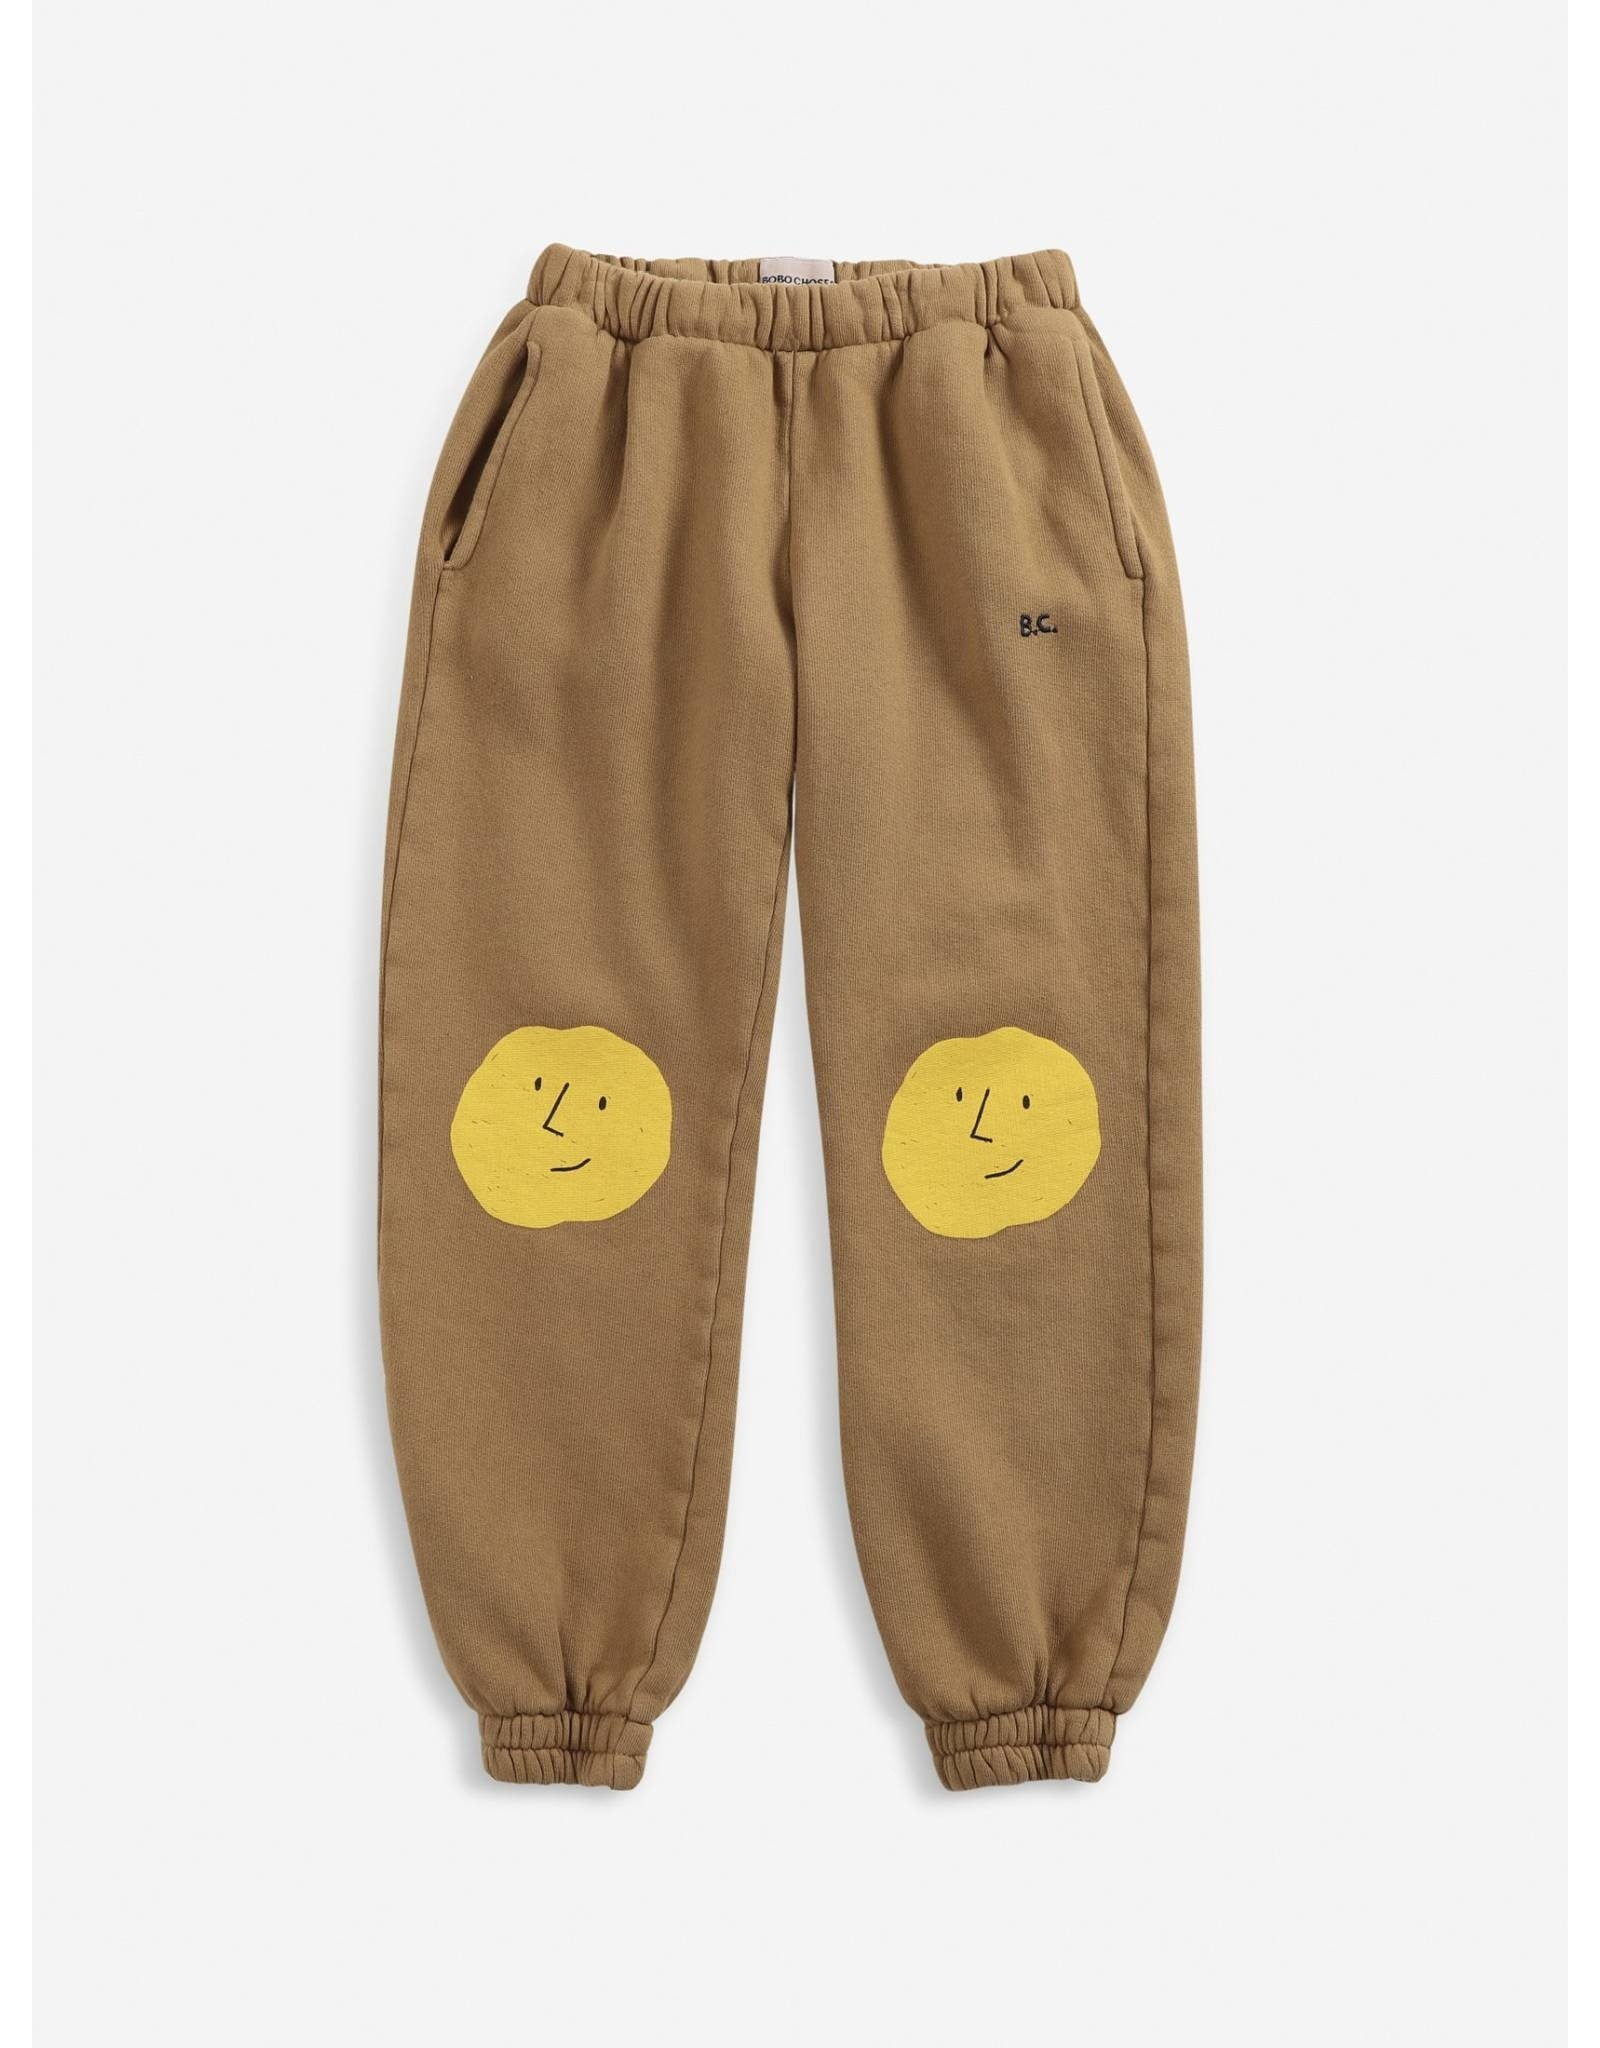 Bobo Choses Bobo Choses Face Jogging Pants @